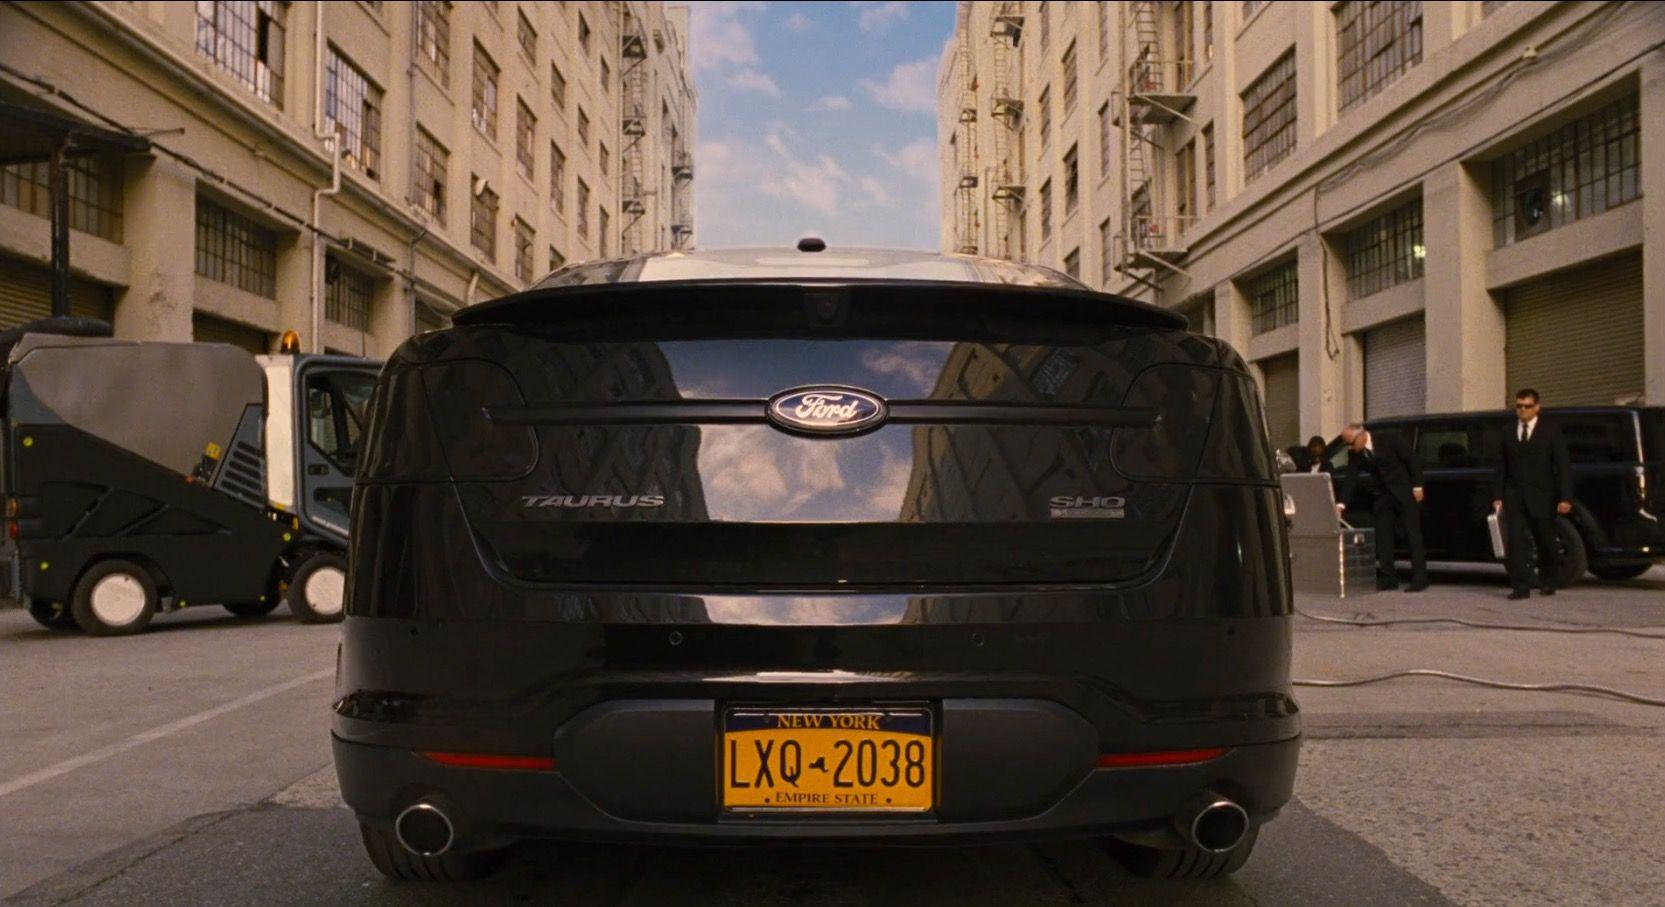 Ford taurus sho 2010 car driven by tommy lee jones in men in black